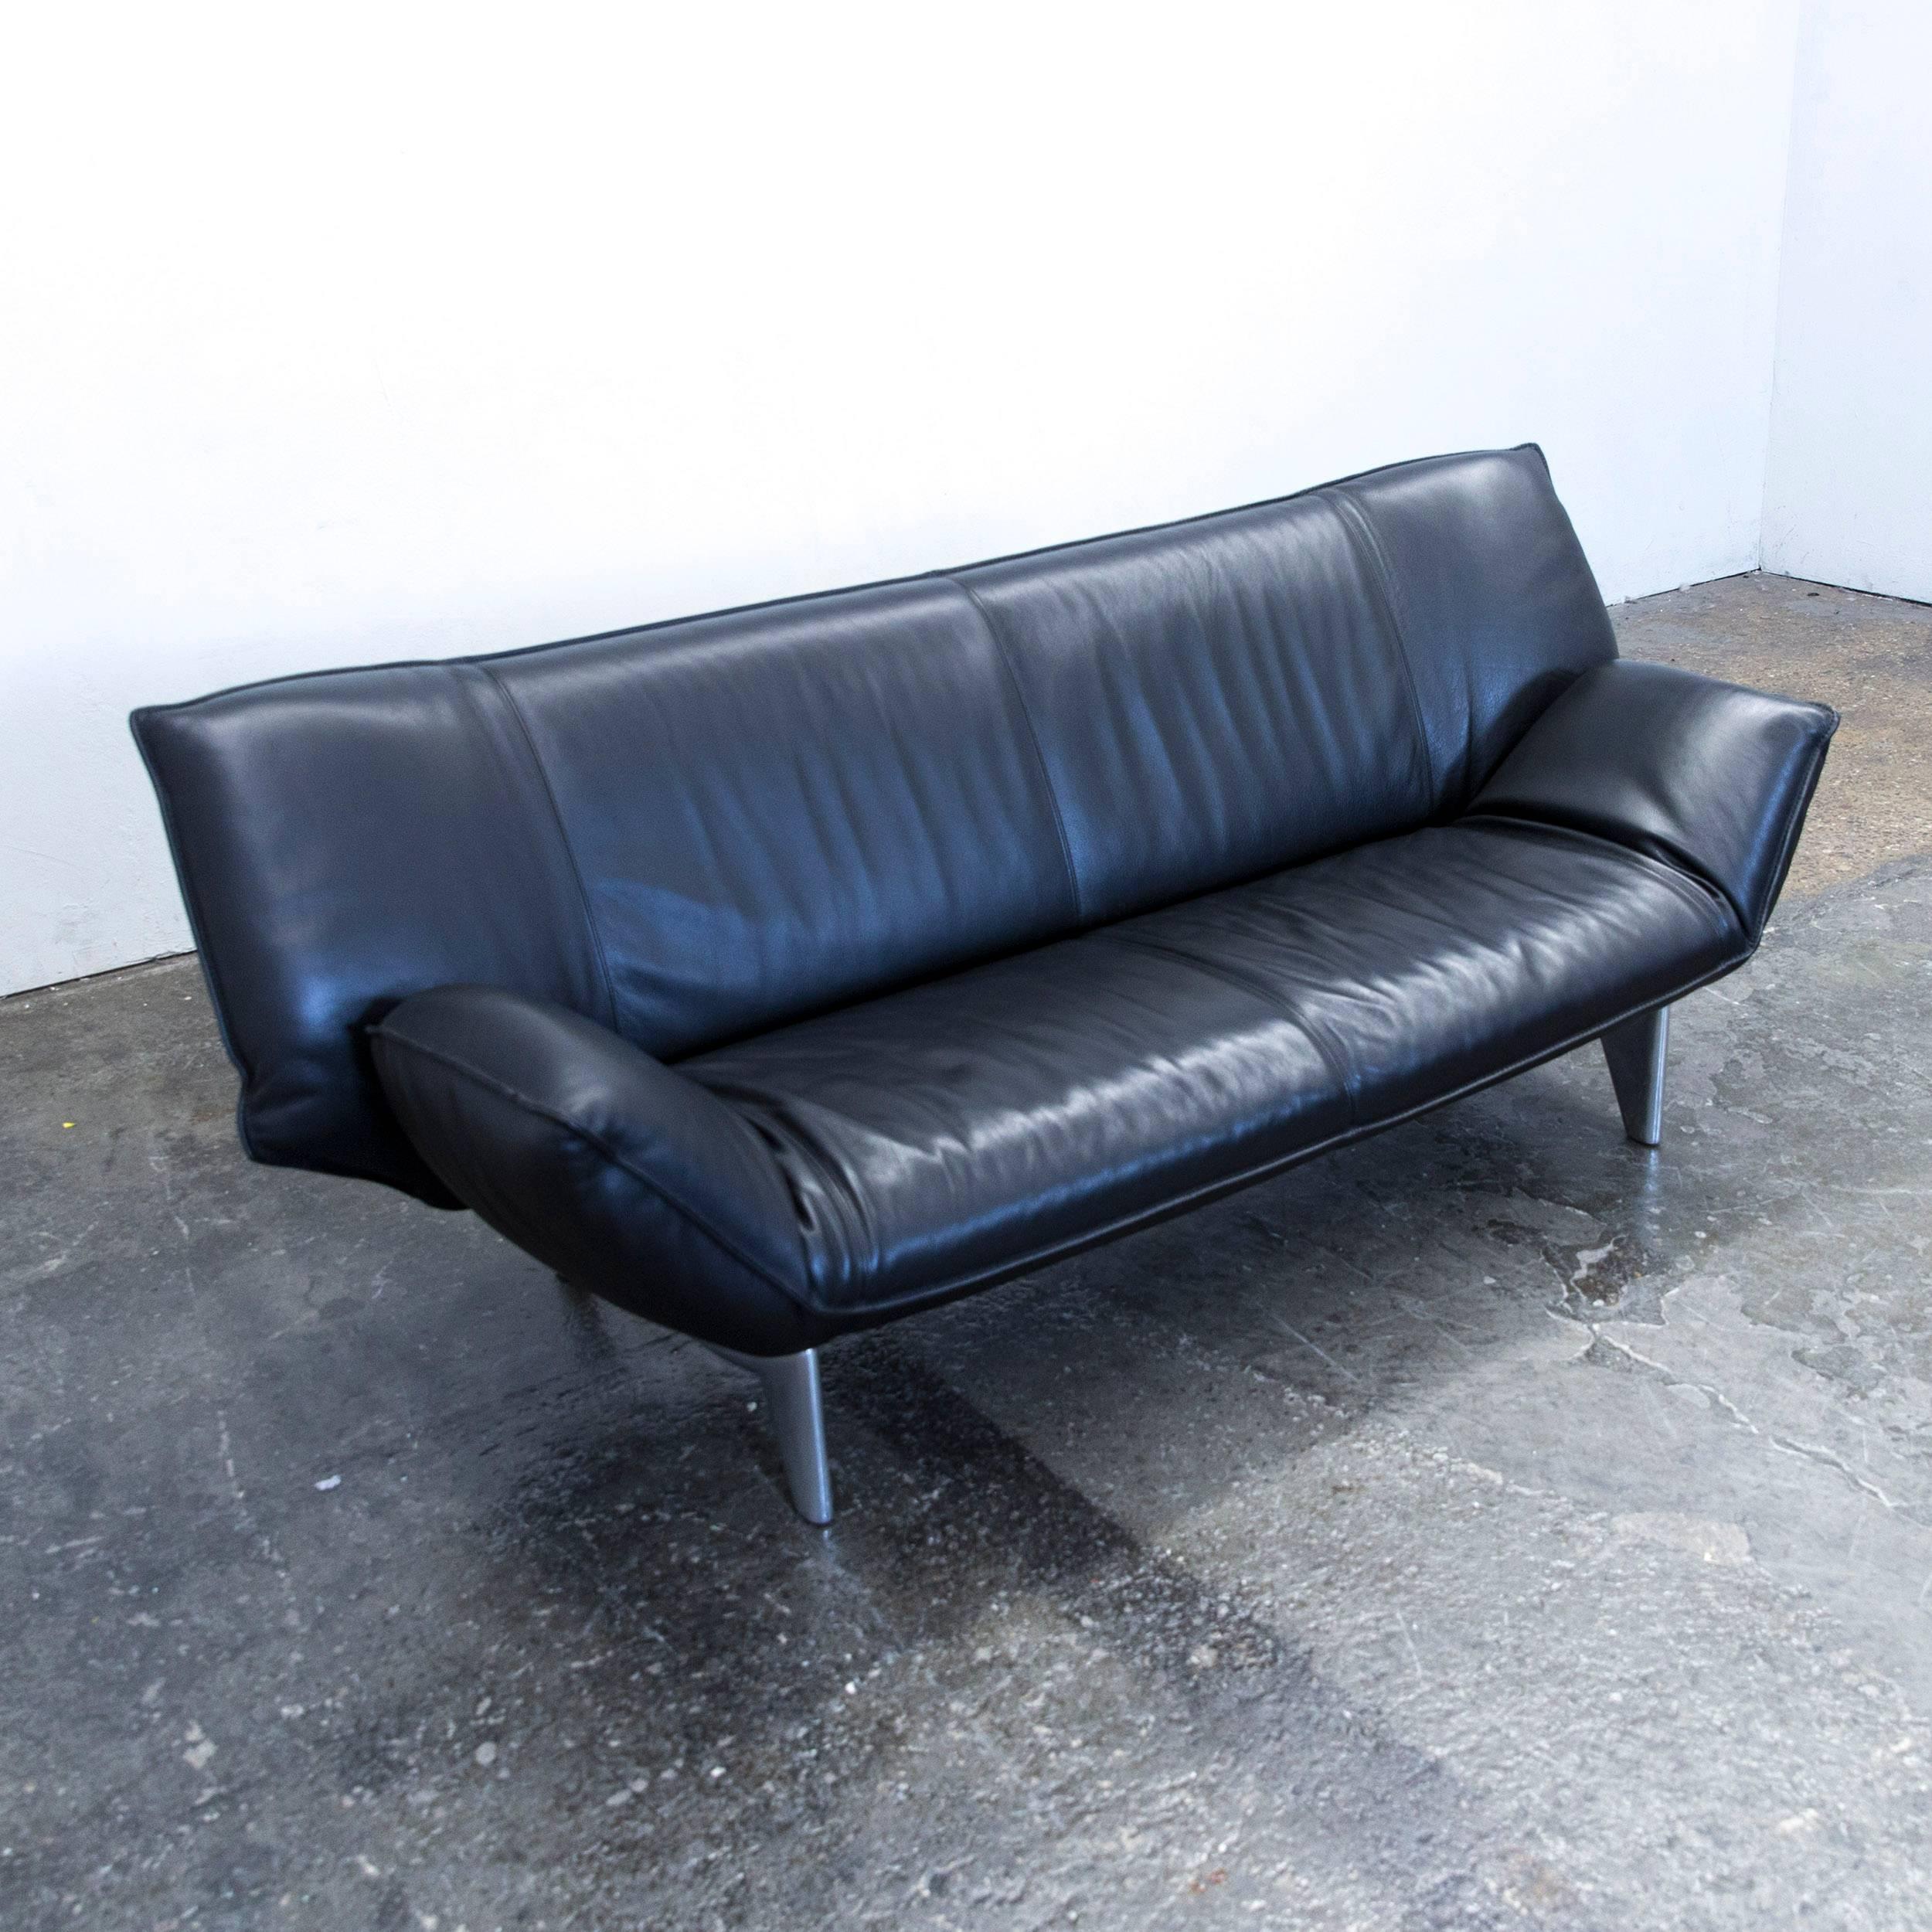 Leolux Tango Designer Leather Sofa Black Two Seat Function Modern